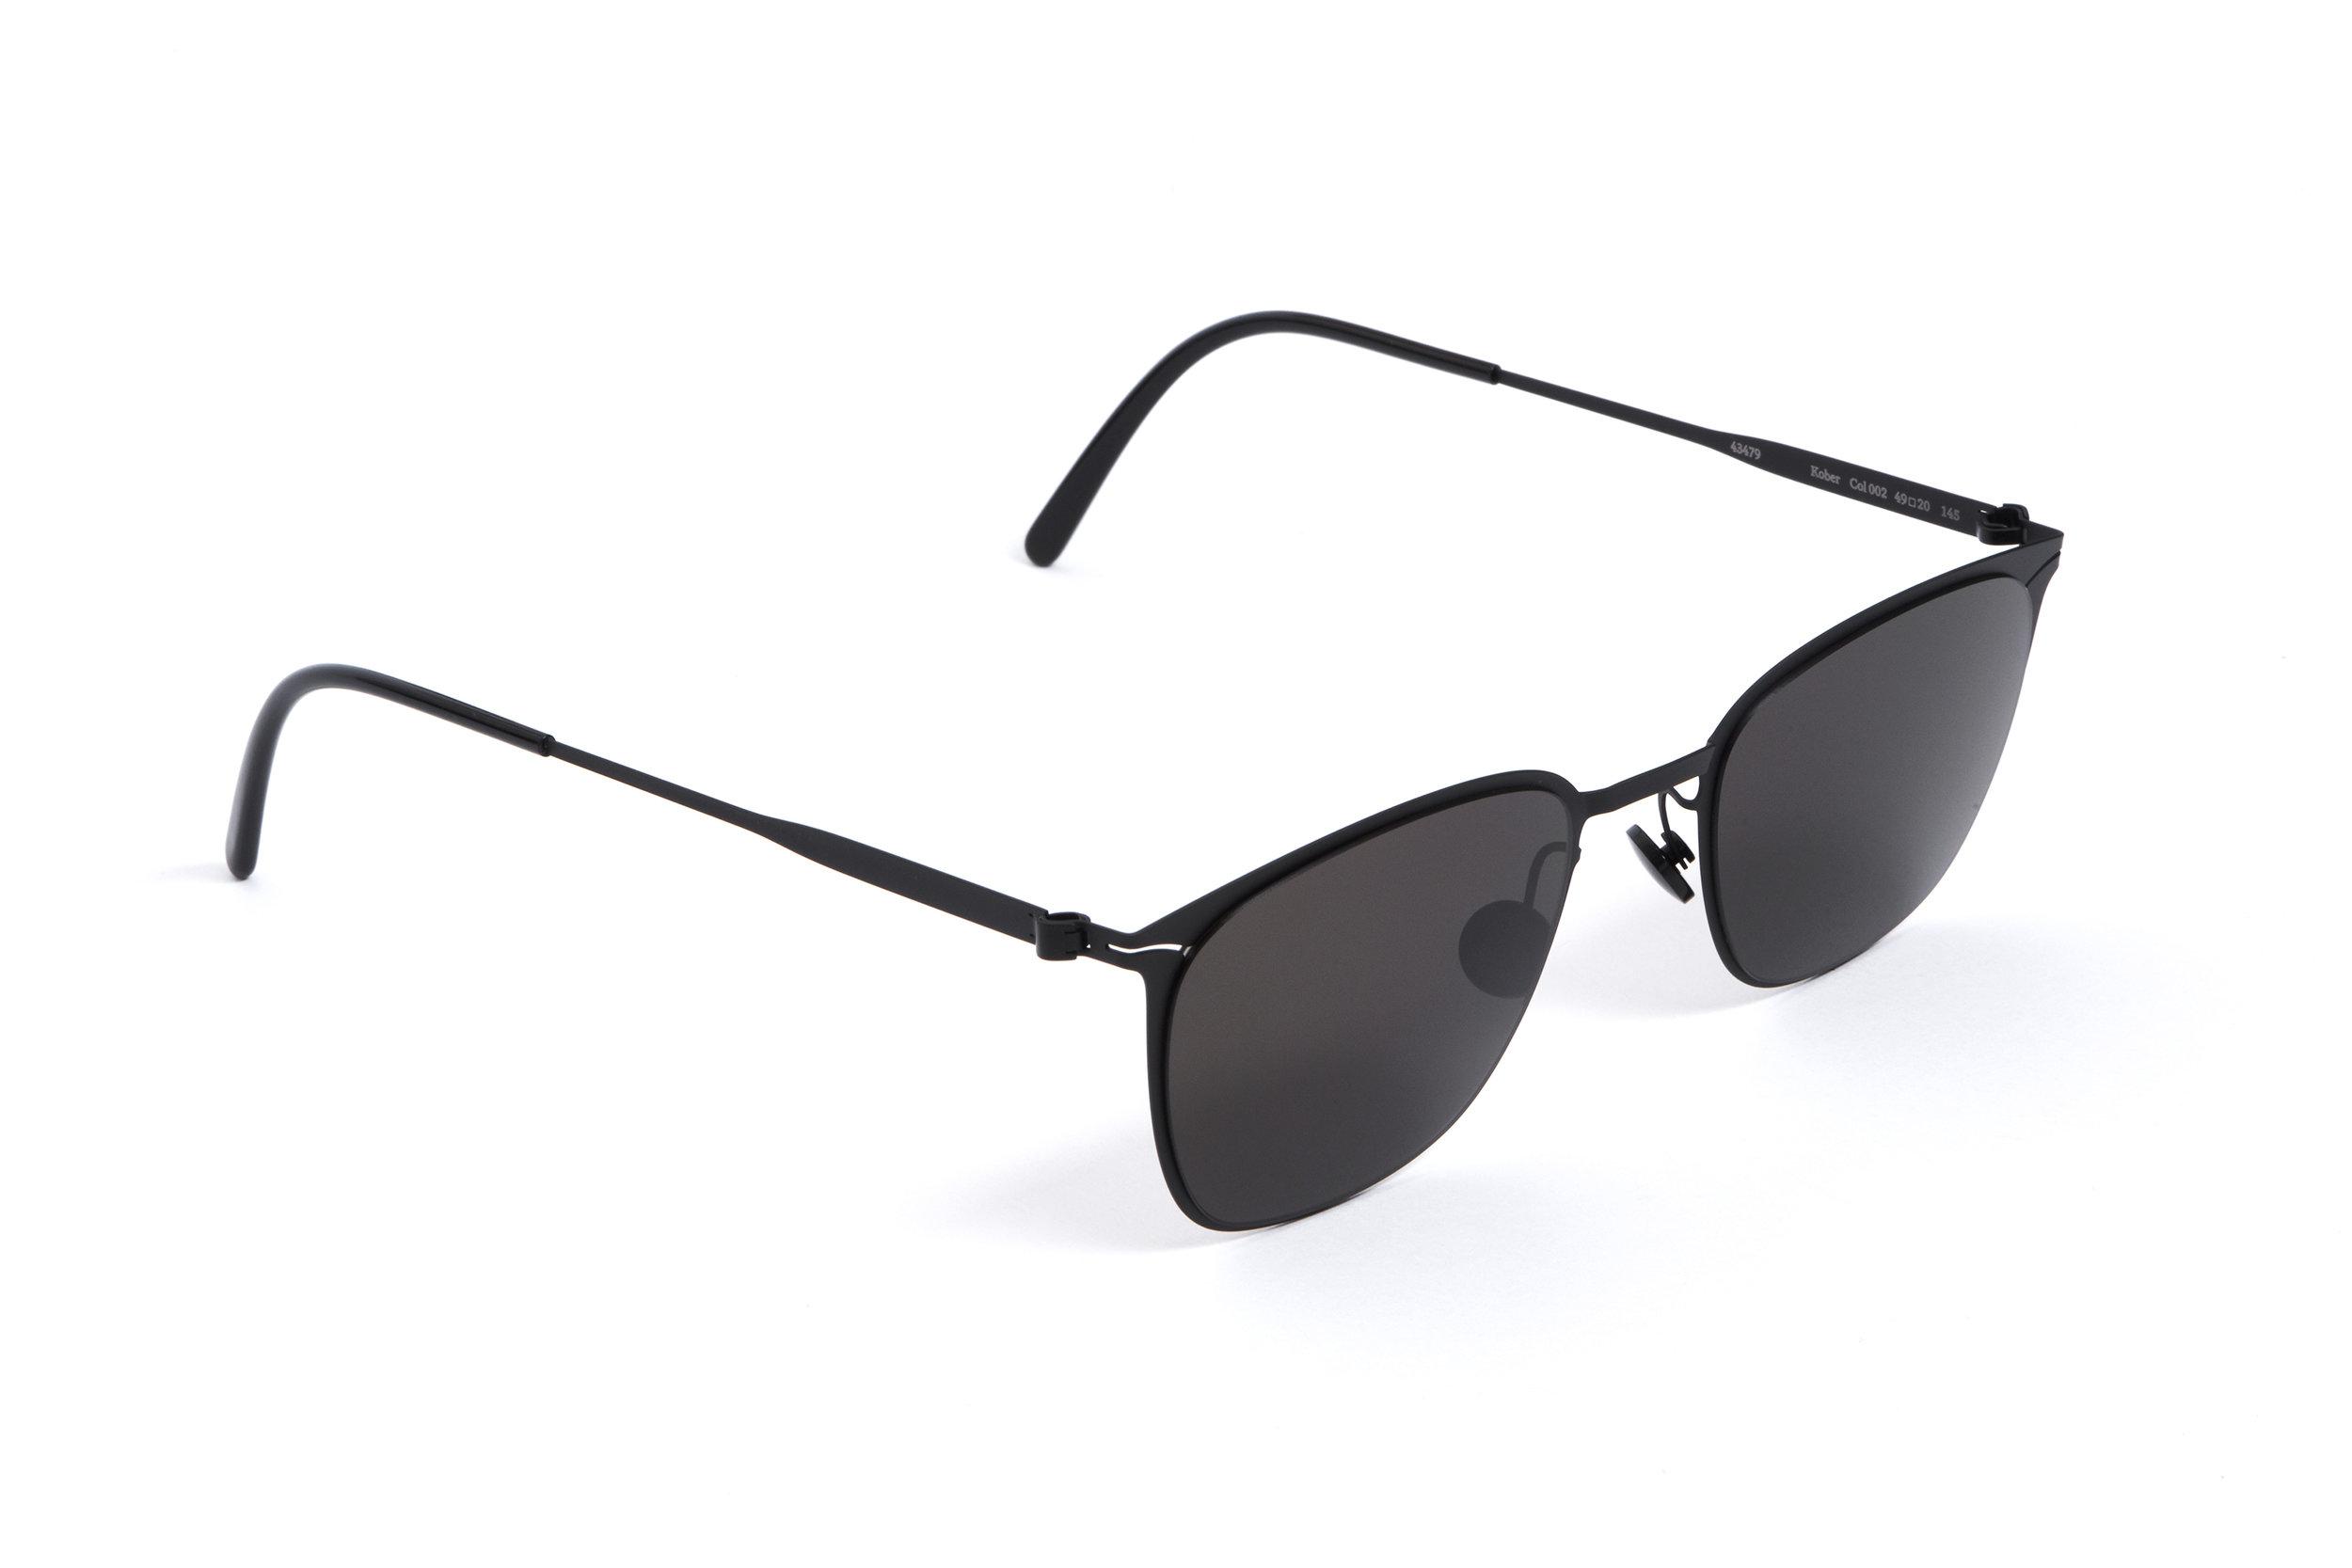 haffmans_neumeister_kober_black_black_grey_line_sunglasses_angle_102424.jpg